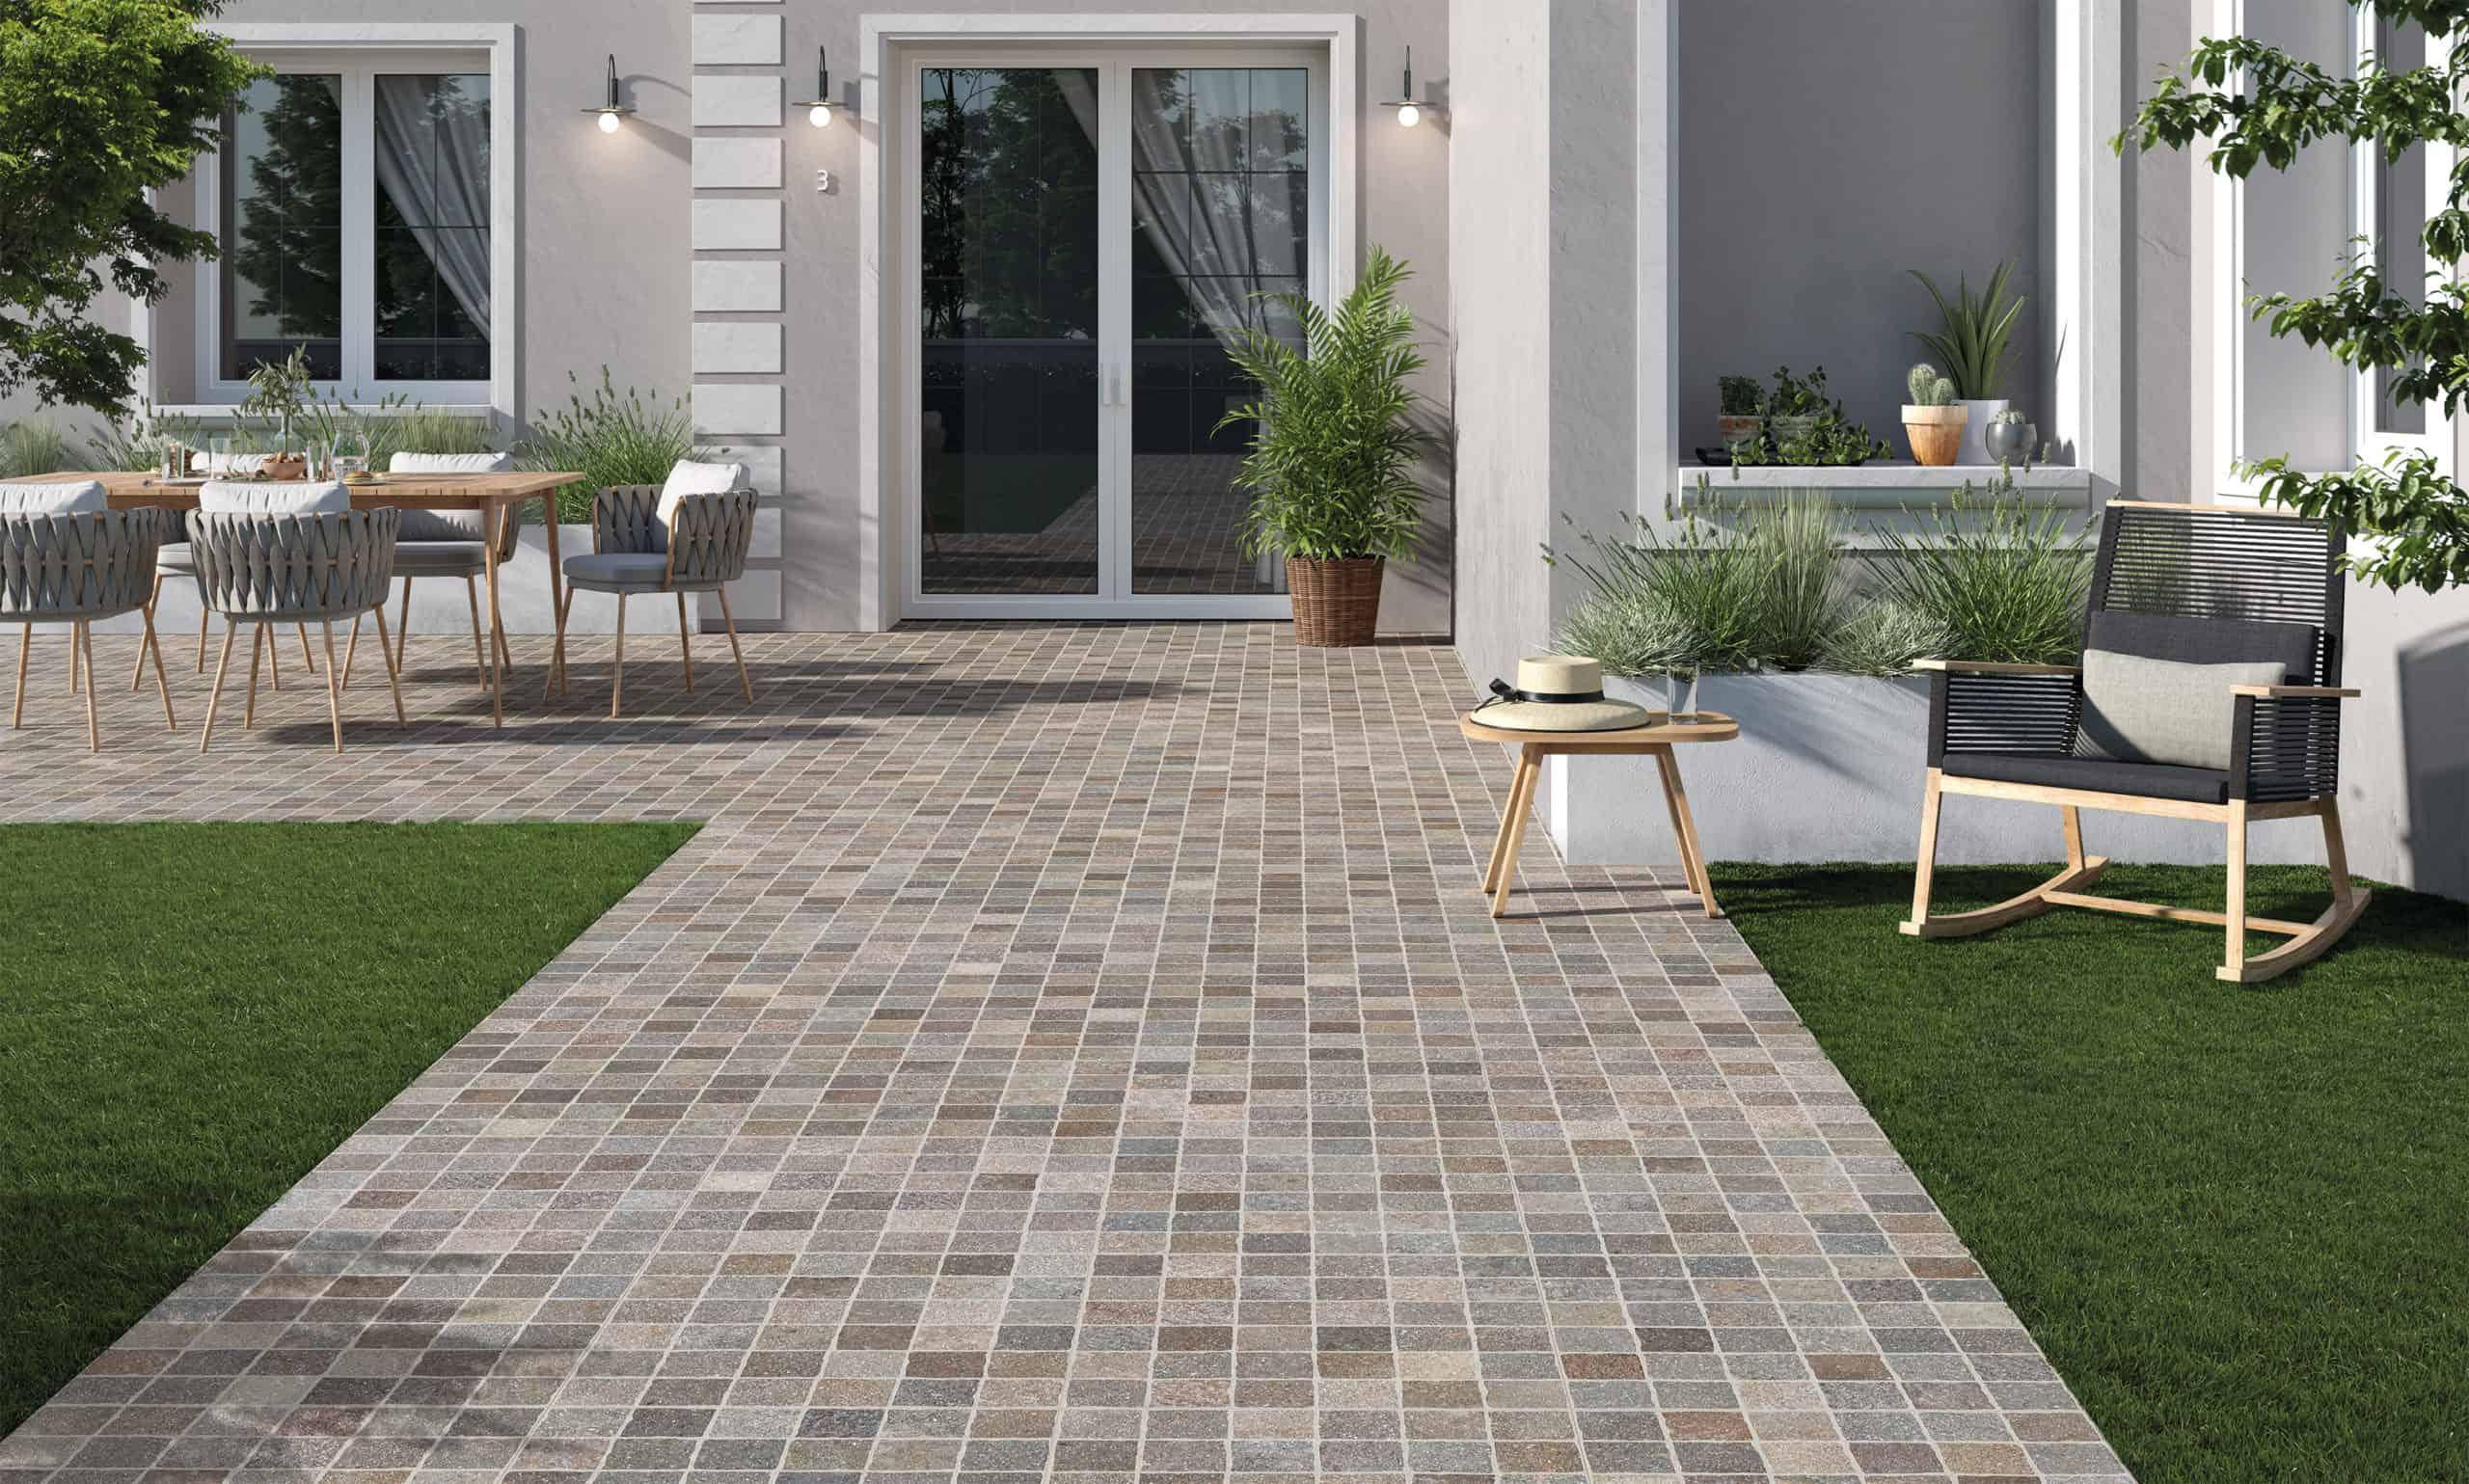 emc tiles aurelia outdoor 20mm porcelain tile range from Rondine ceramica